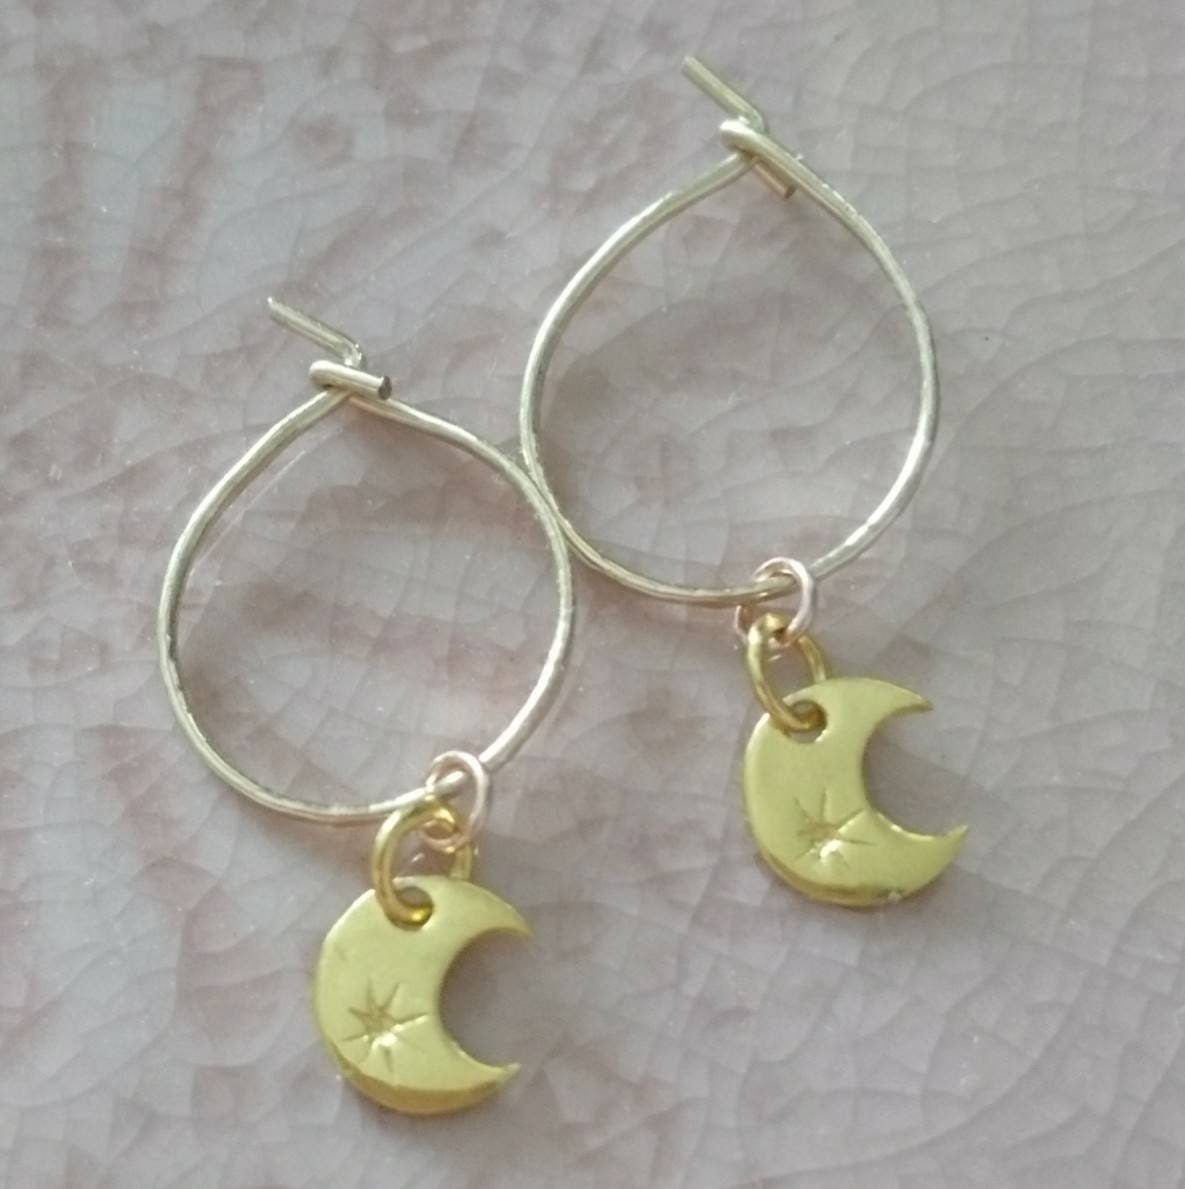 Moon star hoop Gift for her 14 k gold filled earrings tiny hoop earrings dainty celestial hoops